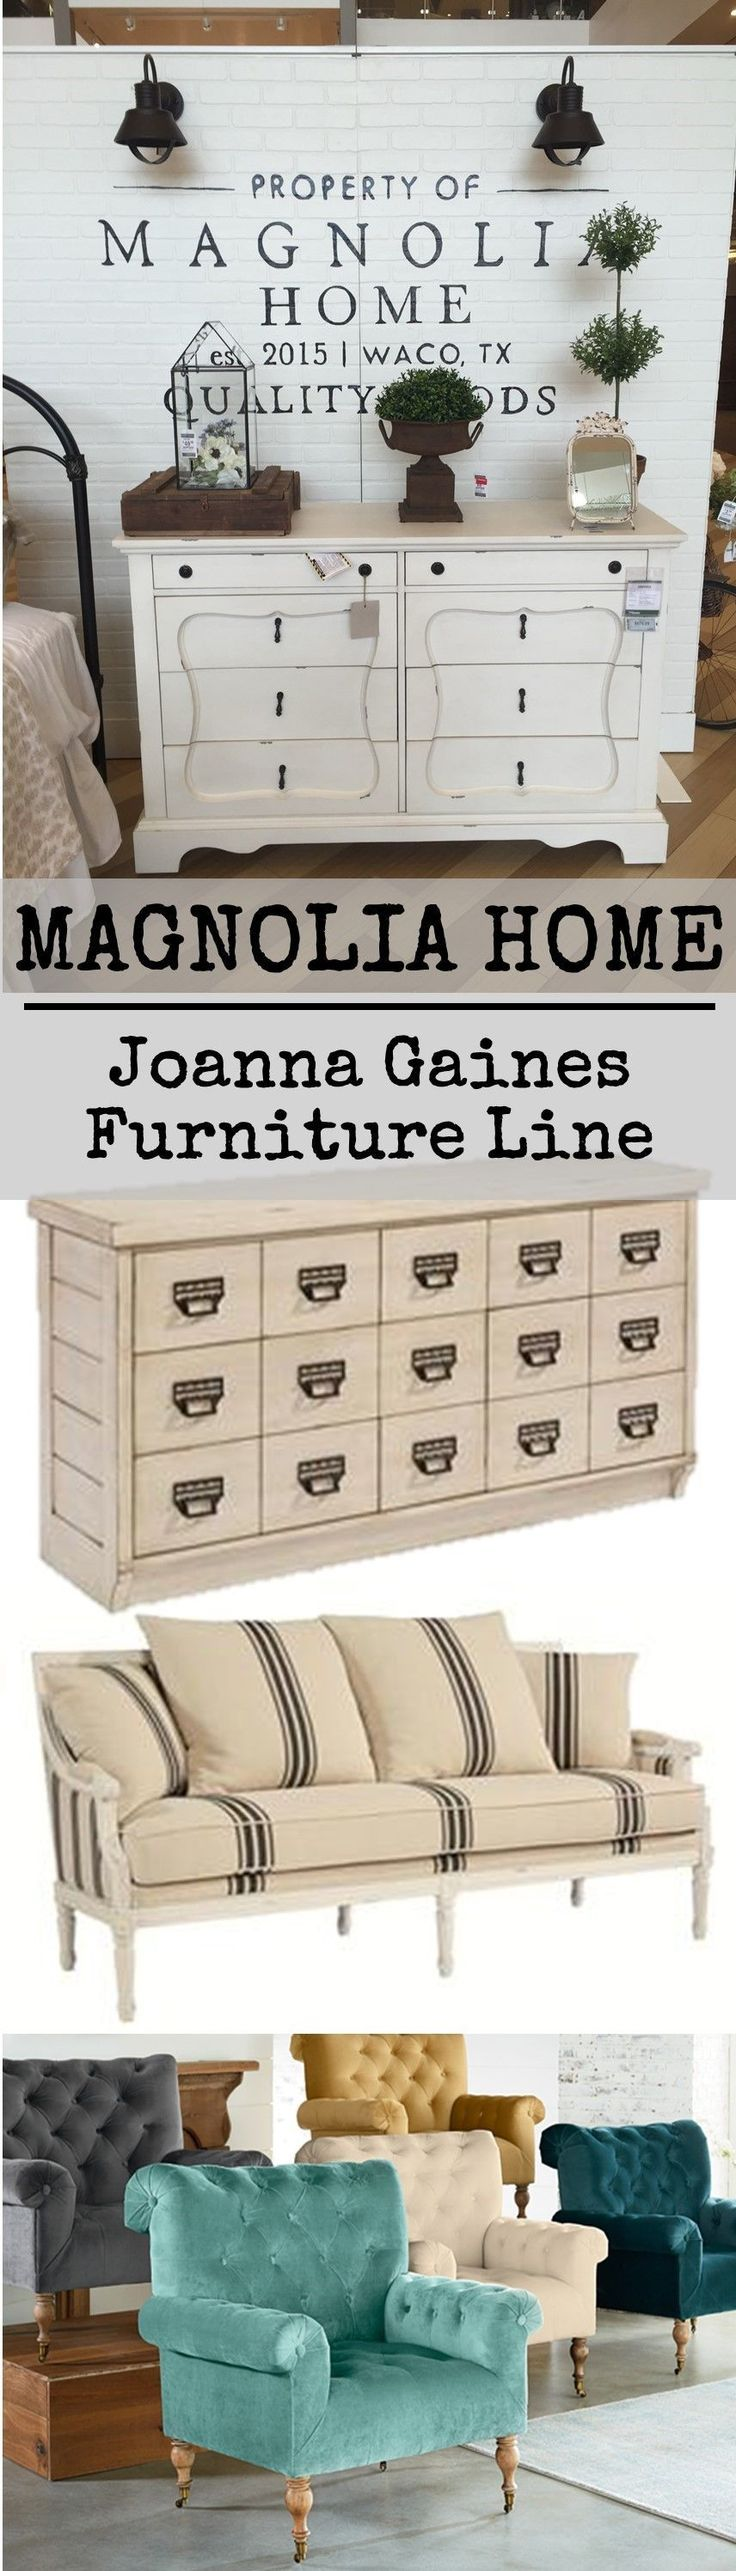 Best 25 Joanna Gaines Furniture Line Ideas On Pinterest Joanna Gaines Paint Color Drake